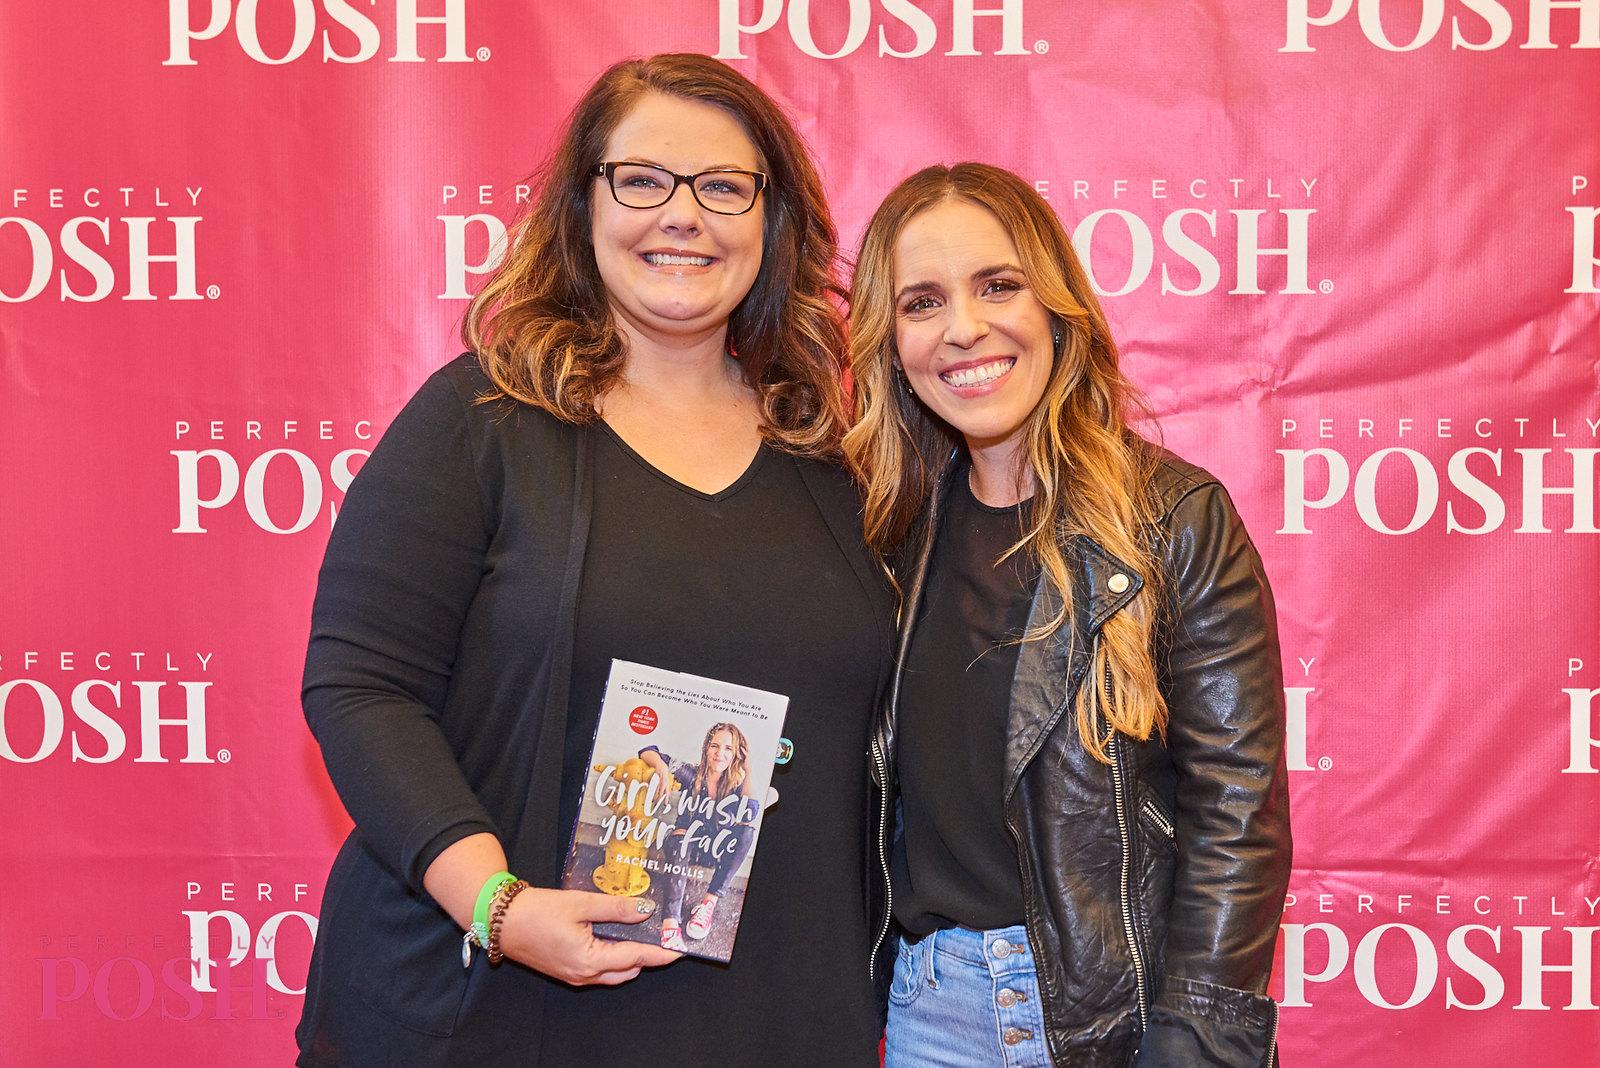 Perfectly Posh UnCon 2019 keynote speaker Rachel Hollis with Influencer